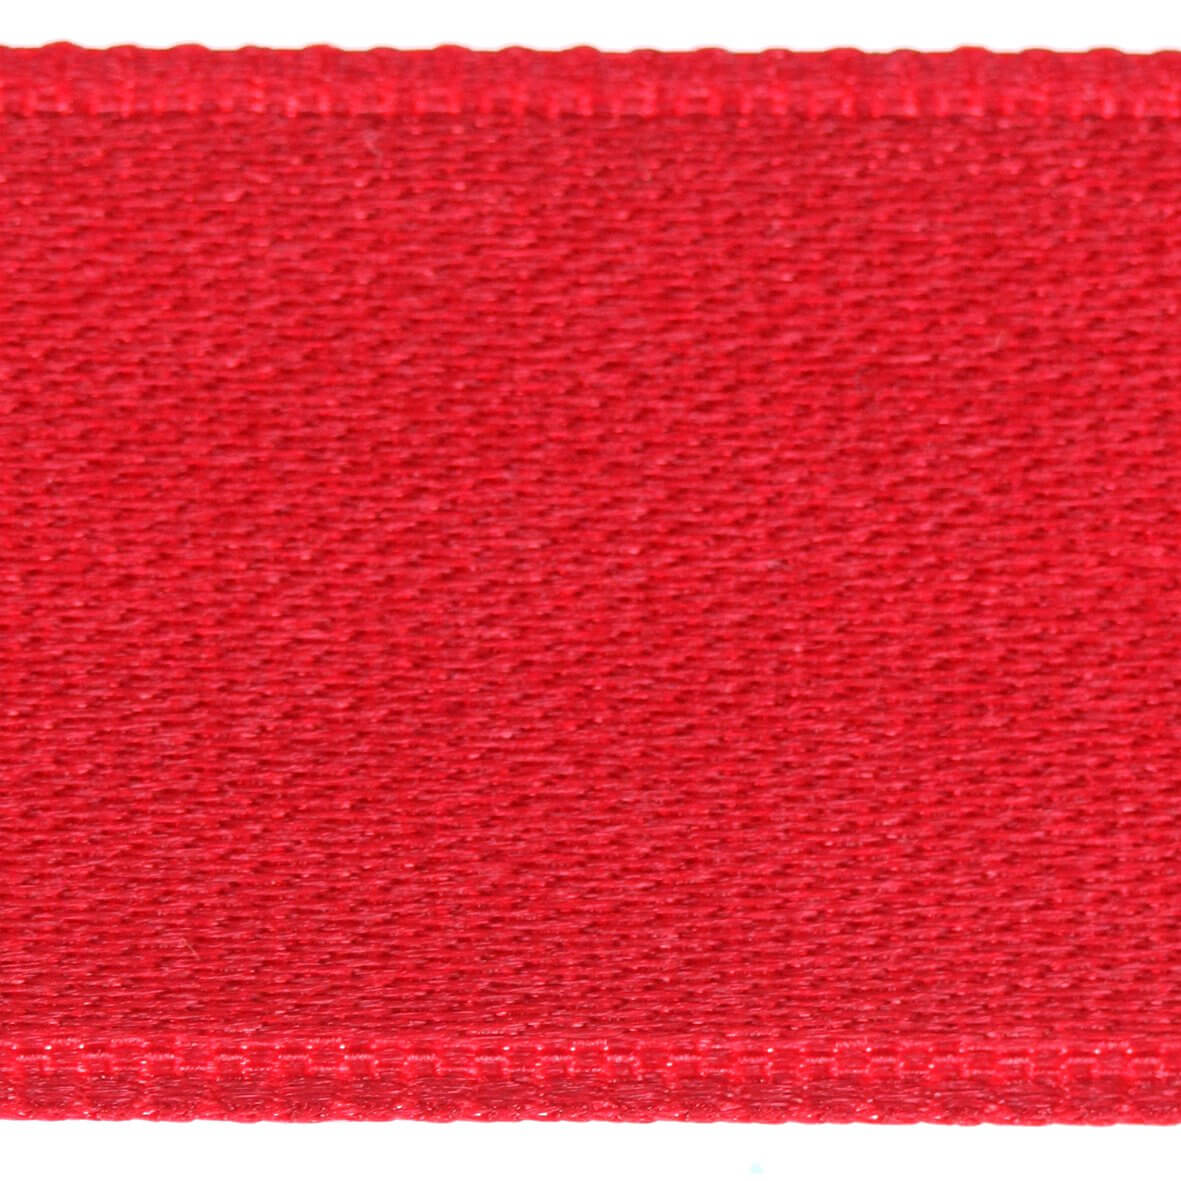 Scarlet Col. 360 - 25mm Satab Satin Ribbon